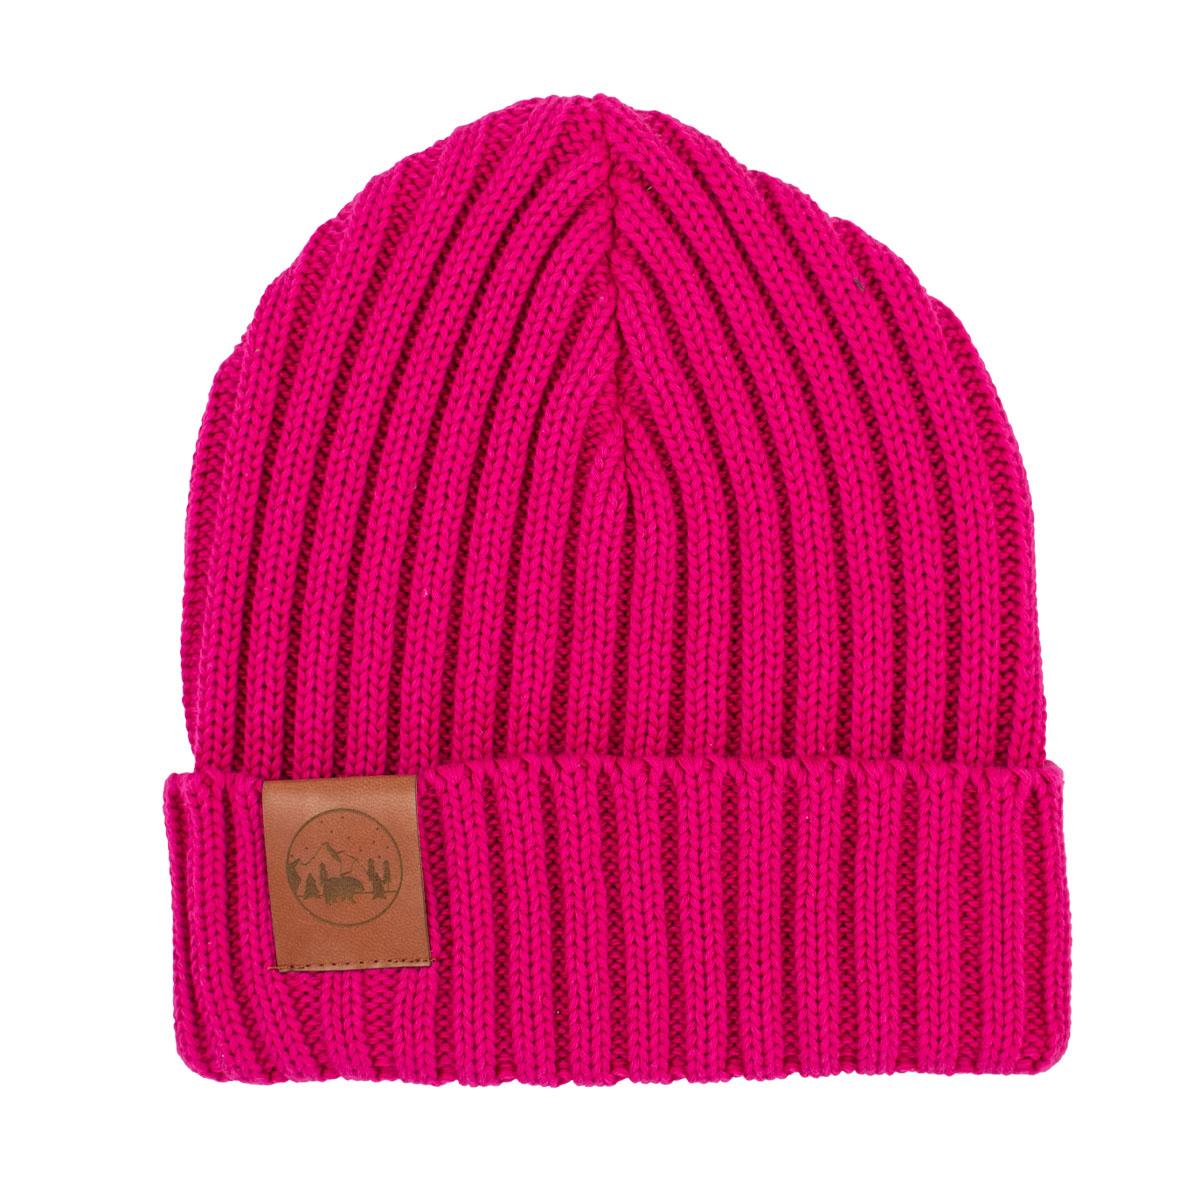 hat_alcatraz_cotton_pink401_kabak_5906742648140